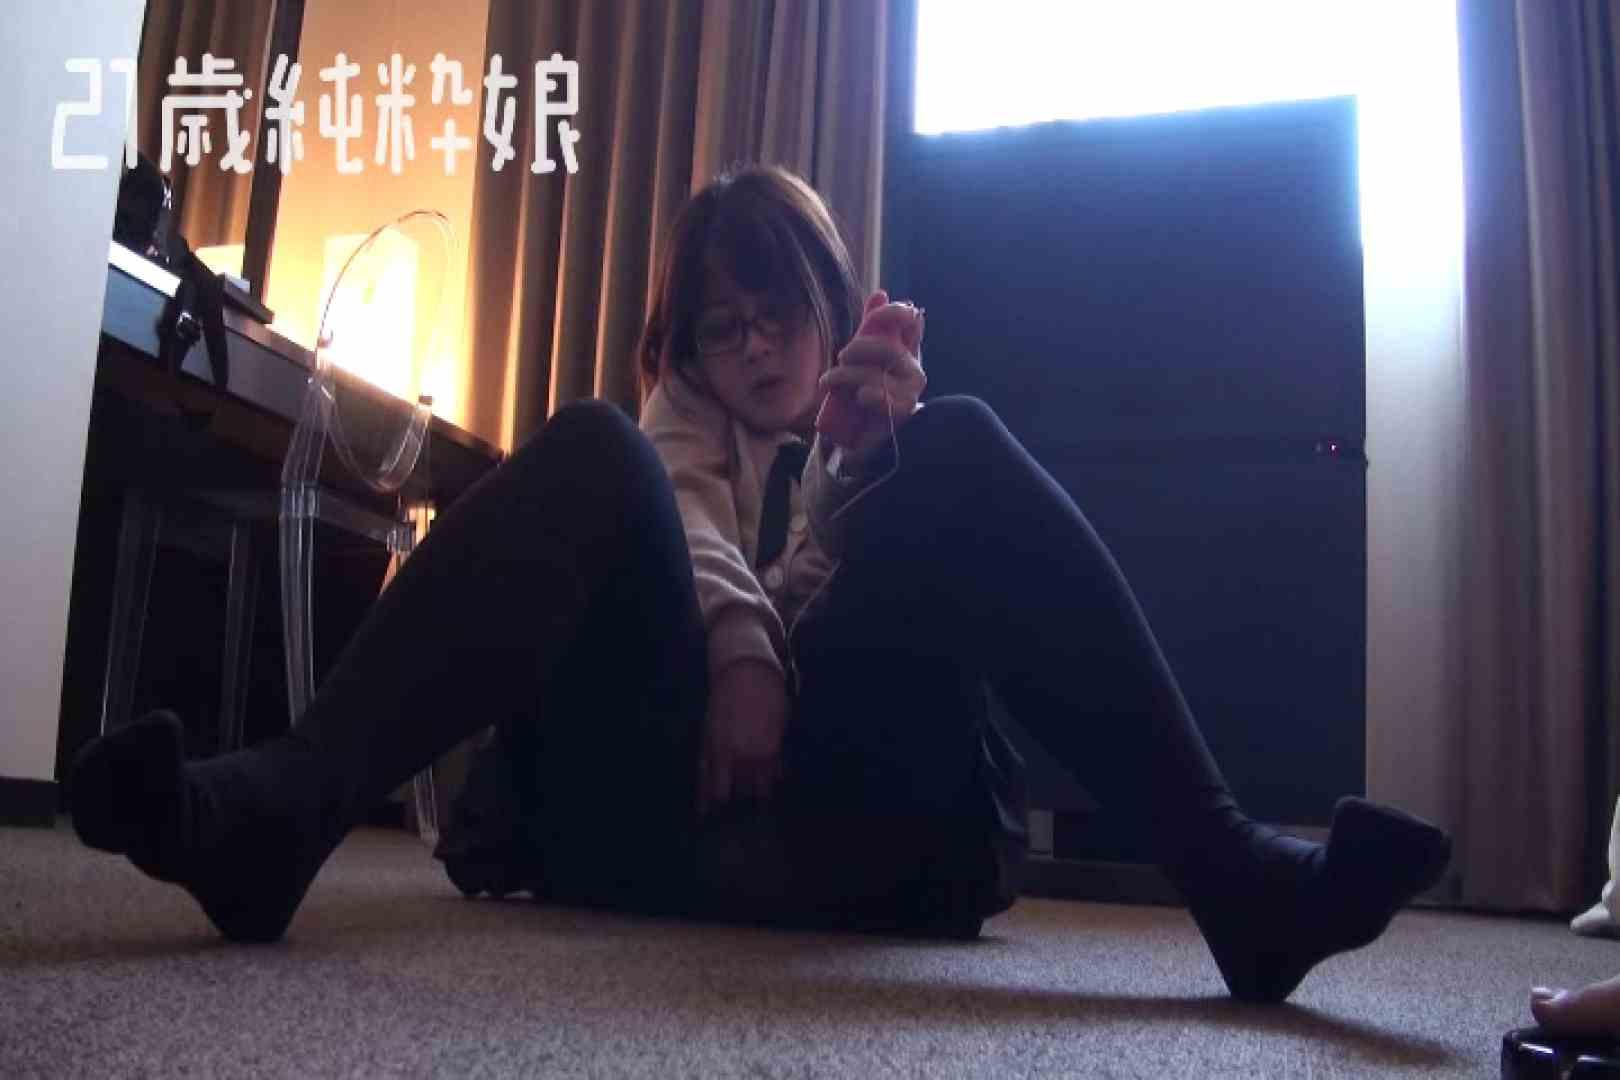 Gカップ21歳純粋嬢第2弾Vol.3 美女OL  95連発 12